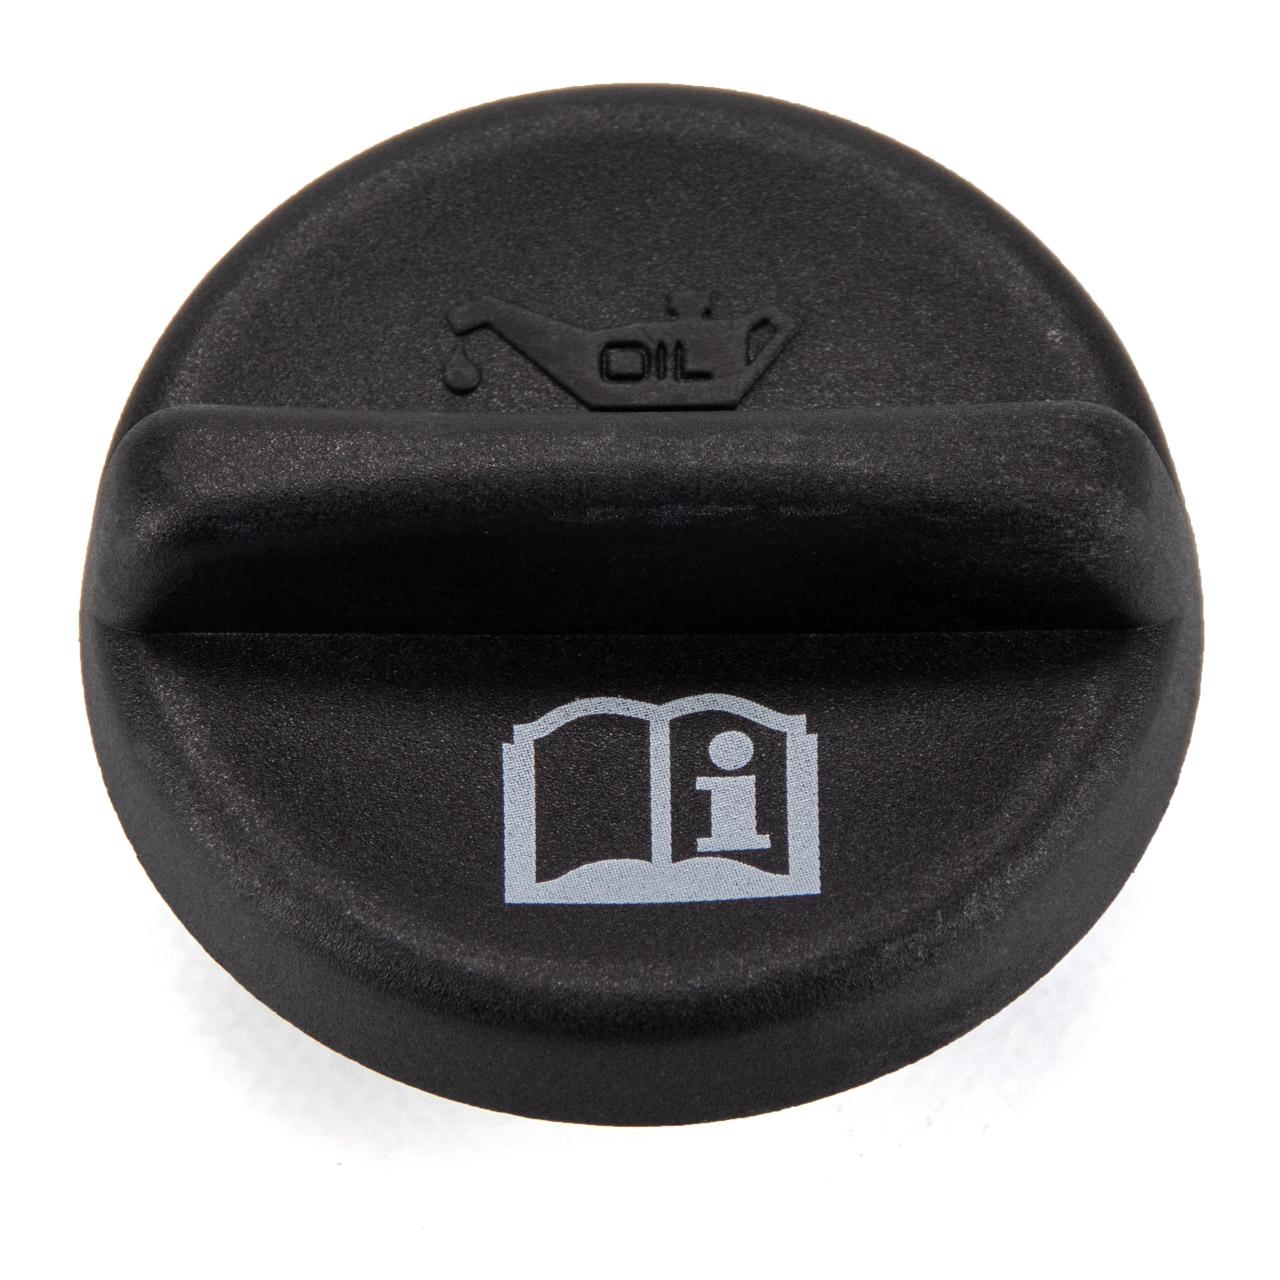 Ölverschlusskappe Öldeckel Ölkappe Ölverschluss OPEL Astra H J Mokka Insignia A 55566555